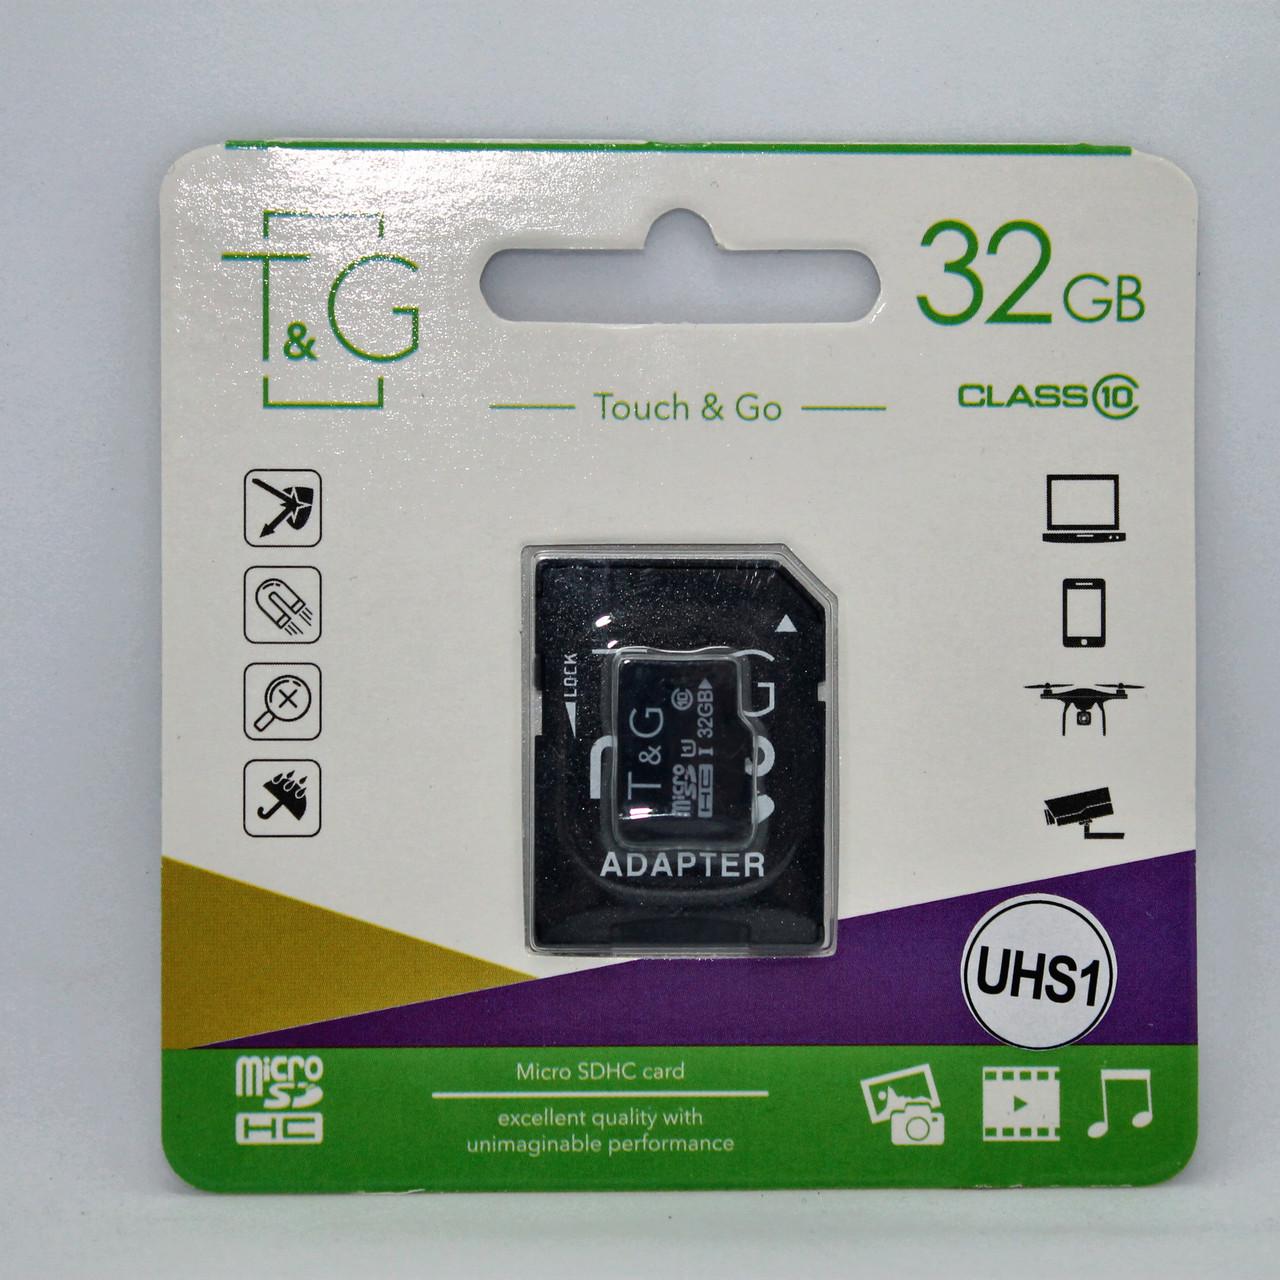 Карта памяти T&G micro SDHC 32 GB Class 10 UHS-1 Адаптер